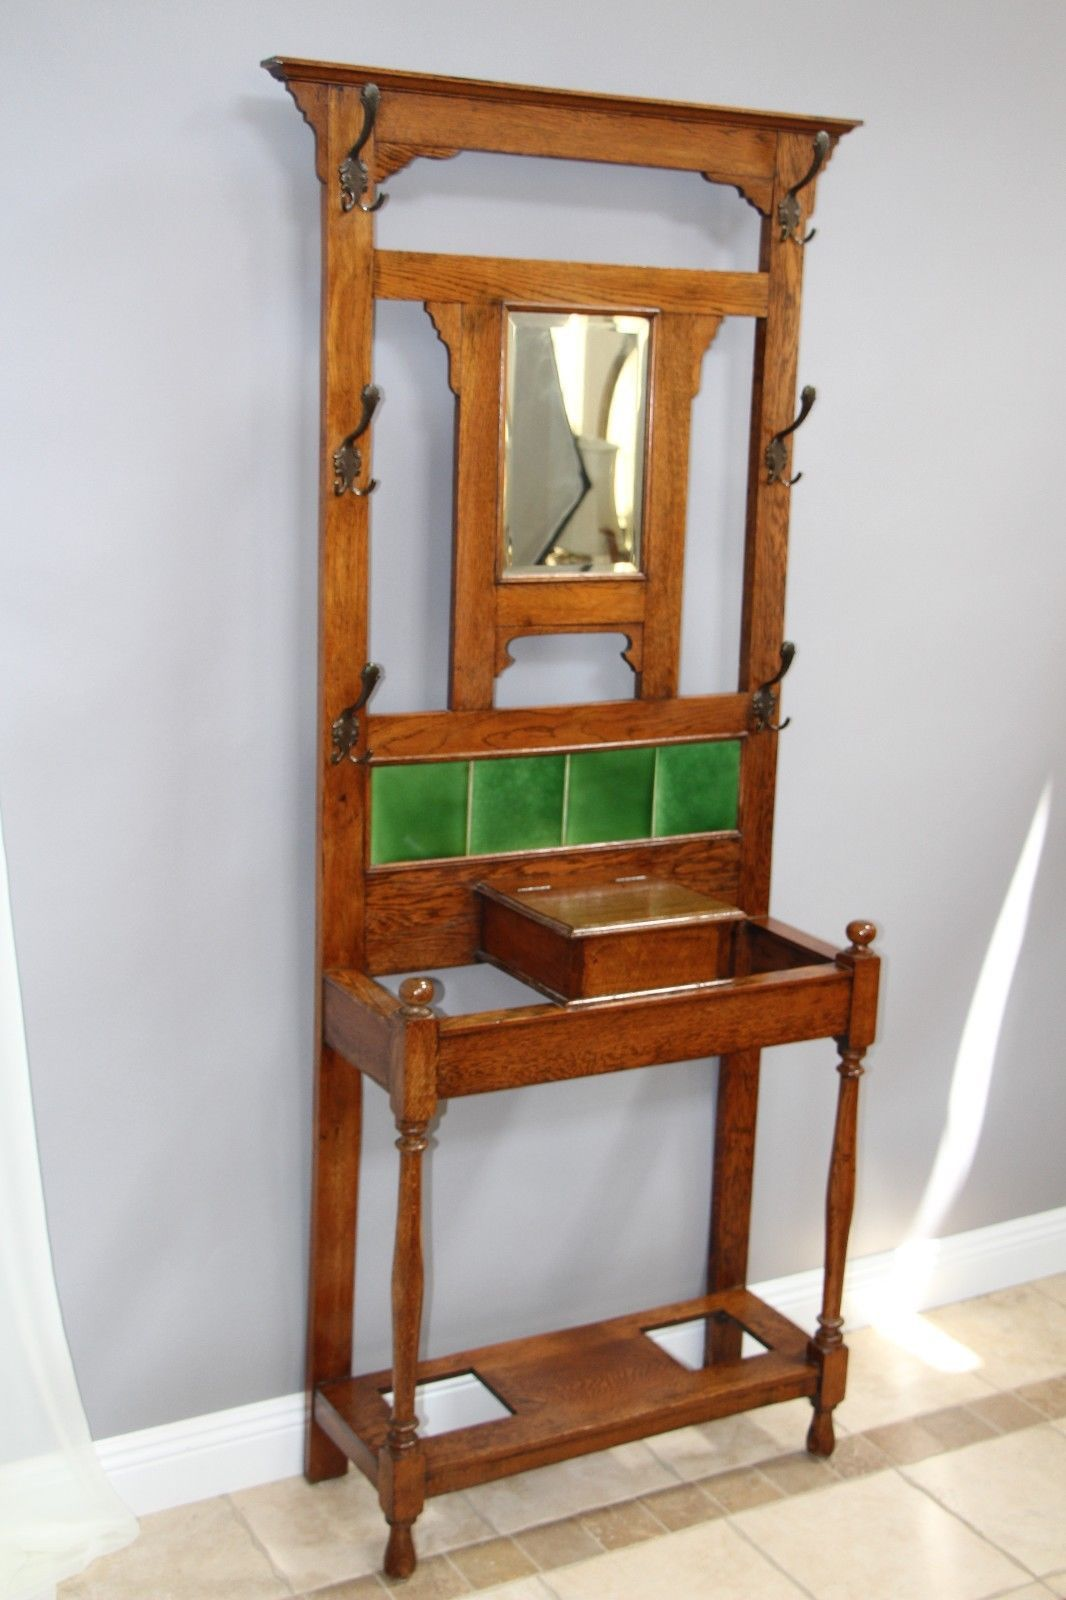 Vintage Oak Hall Tree with Beveled Mirror Coat Hooks Storage Green Tiles | eBay